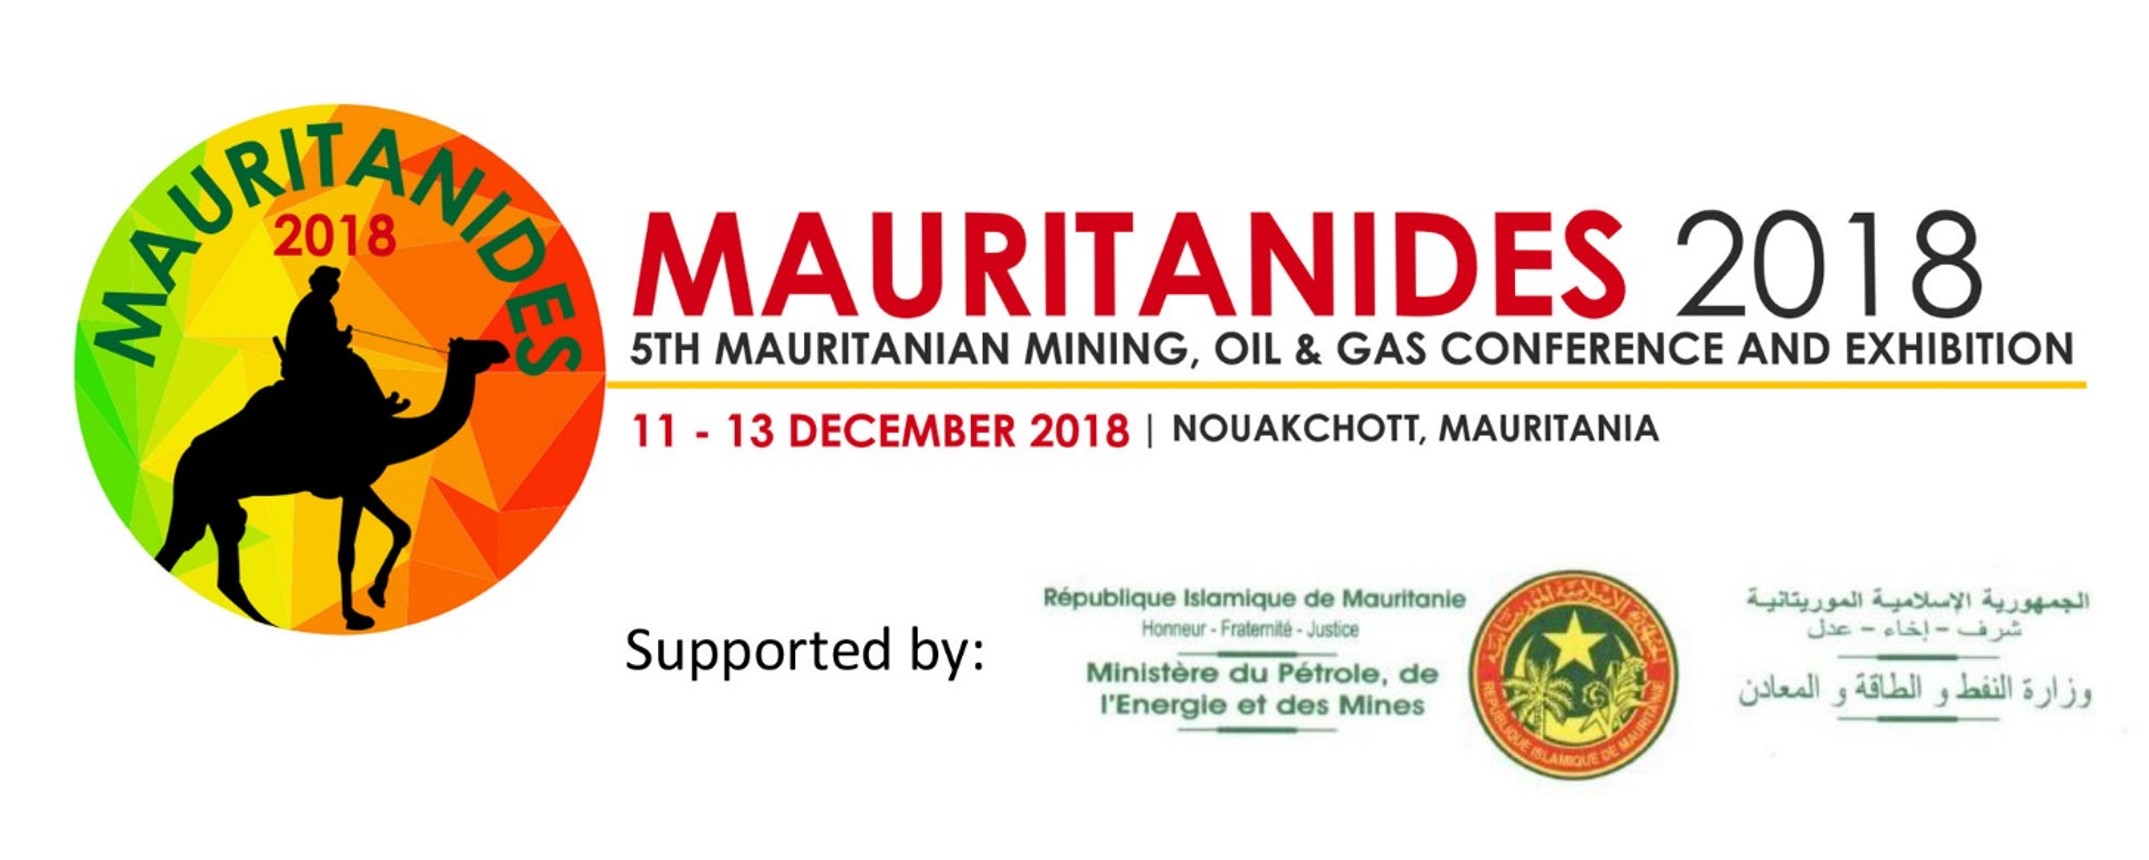 Mauritanides - Mauritanides 2018 Movemeback African event cover image